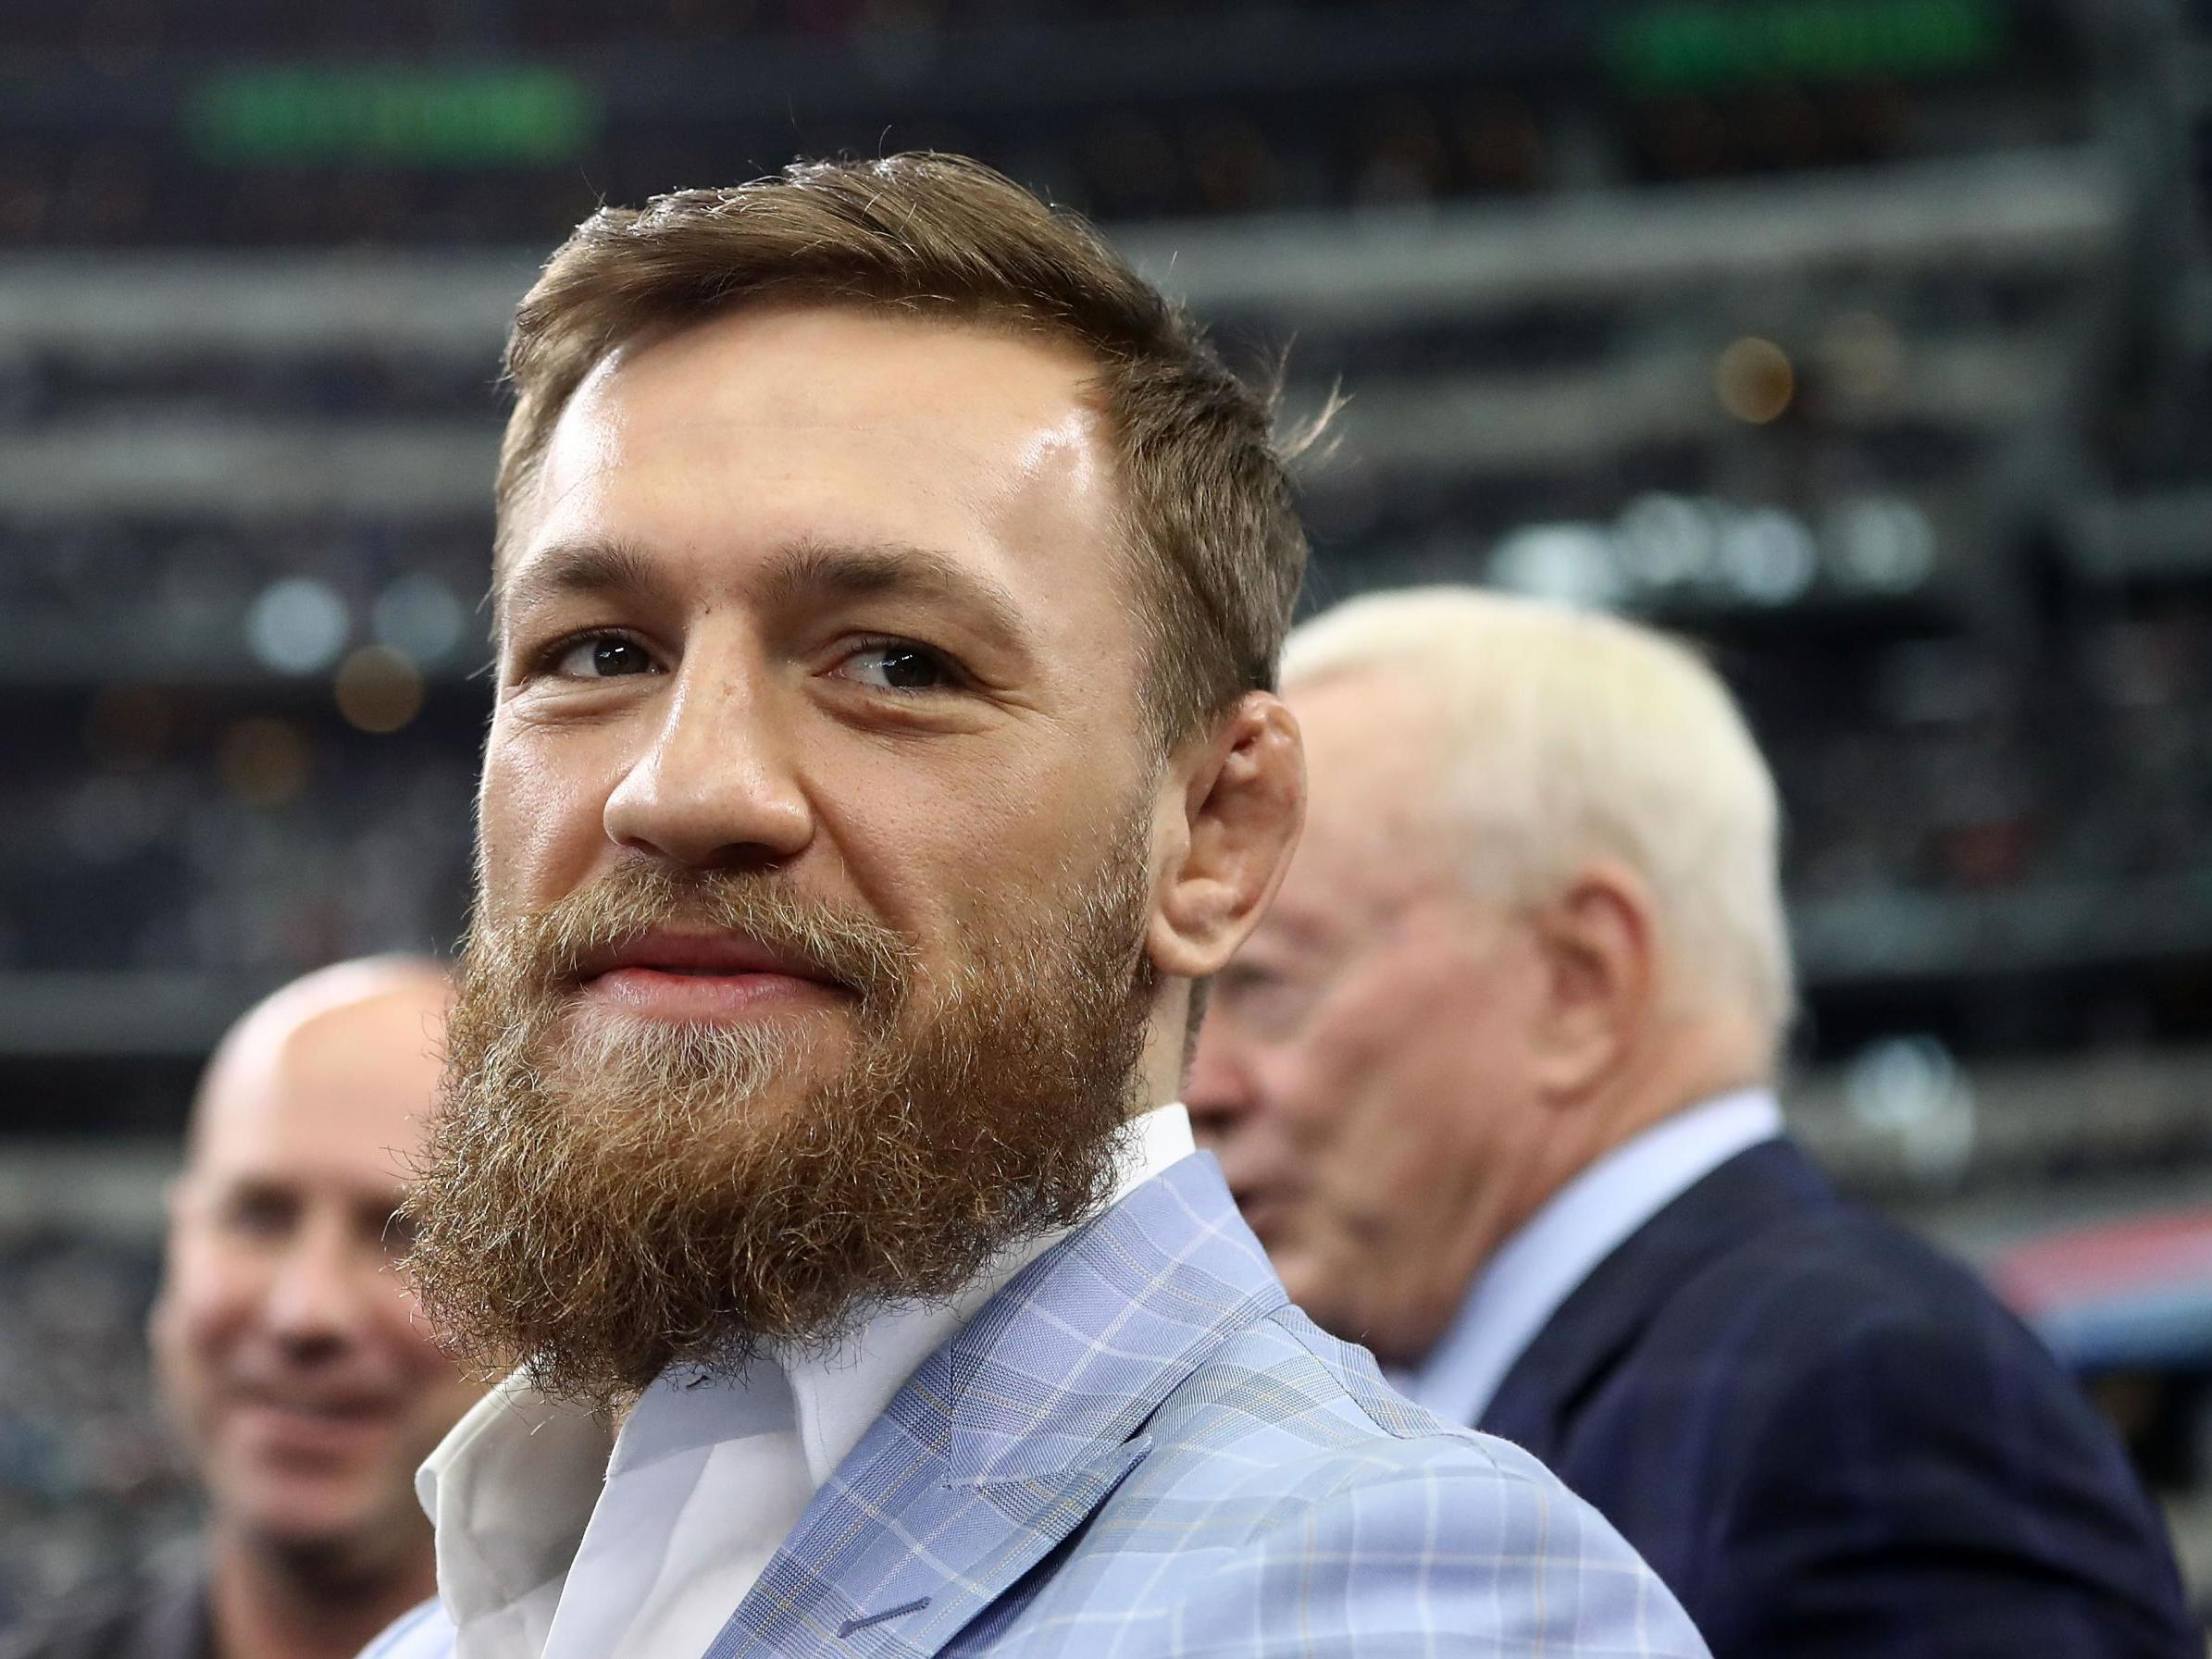 Conor McGregor: UFC superstar drops hints over December return to Octagon in Dublin